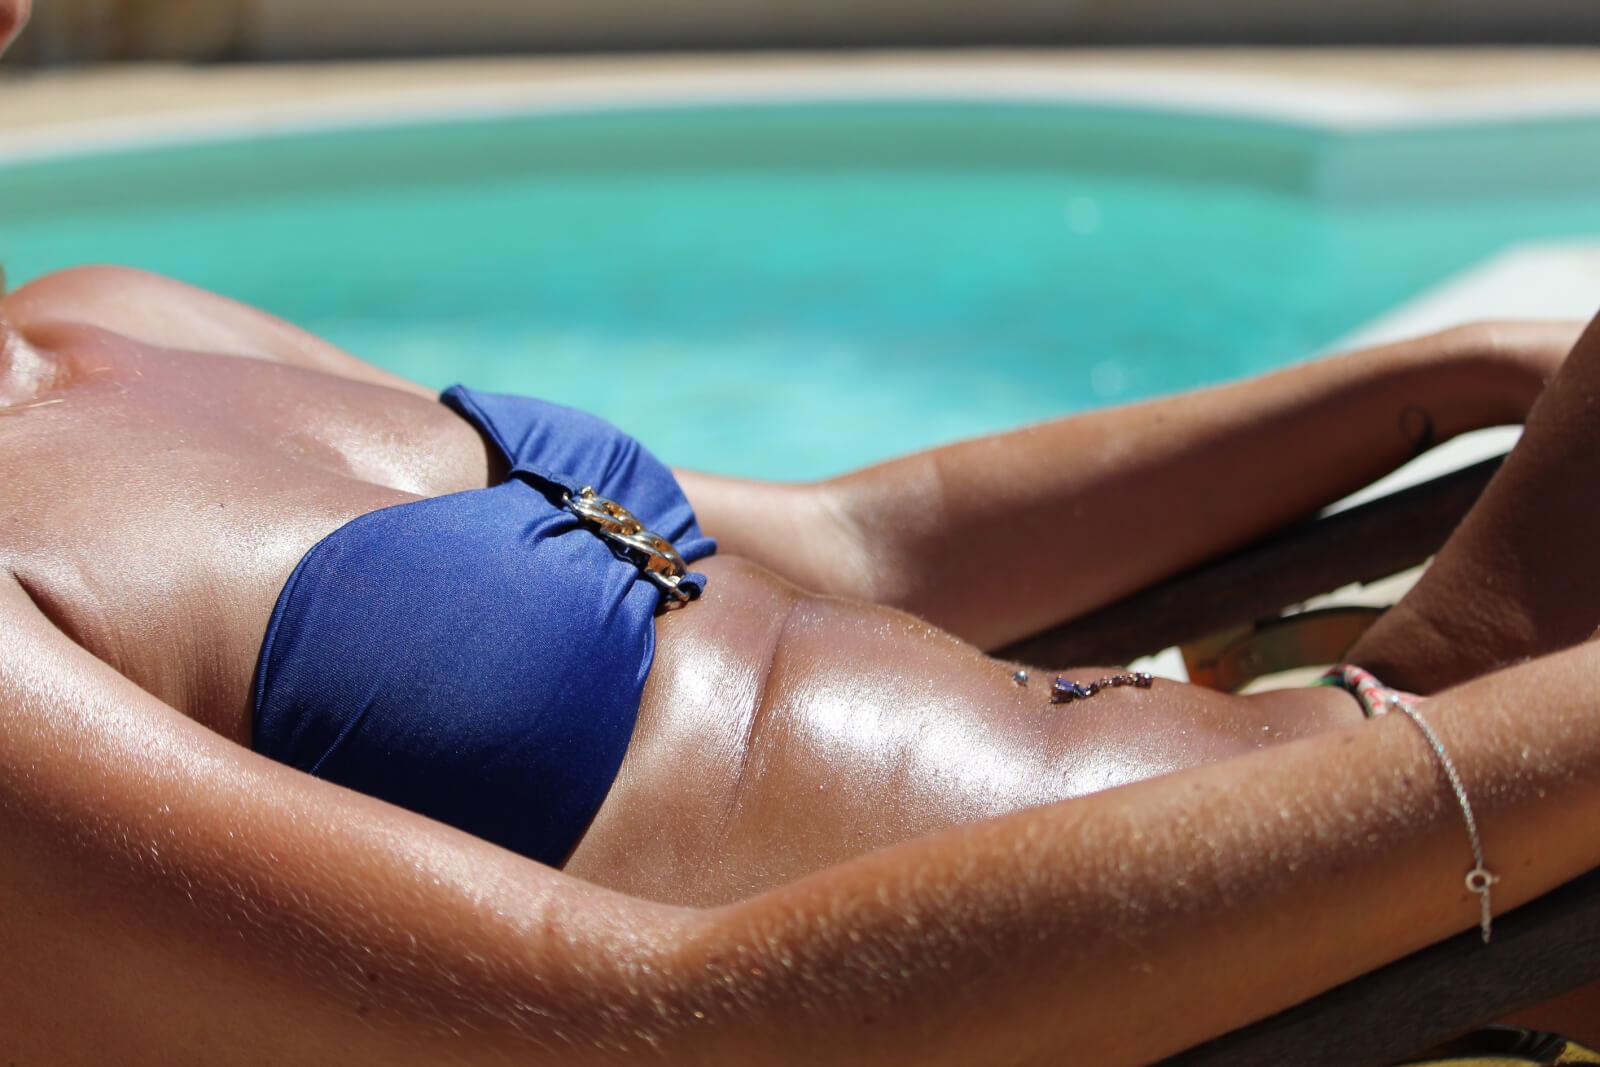 Maria-Galland-Soft-and-Gentle-Cream-Deodorant-abloomnova.net_-1600x1067 Sunscreen for darker skin